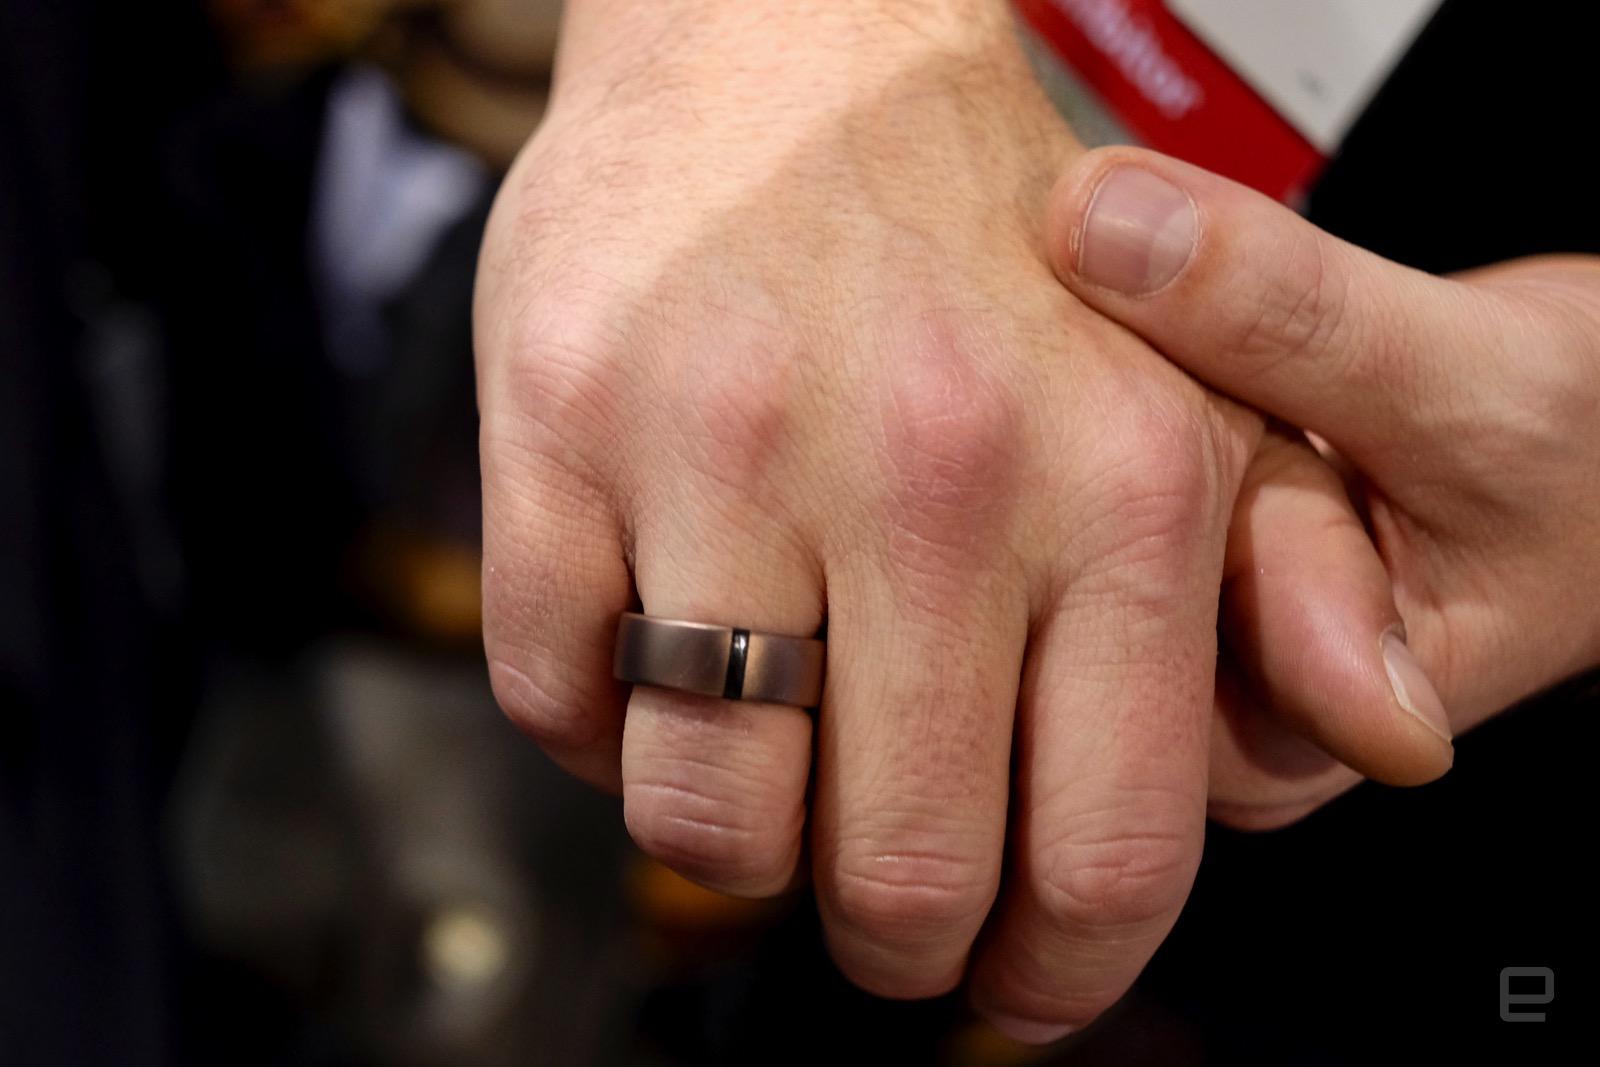 Motiv crammed a full fitness tracker into a ring